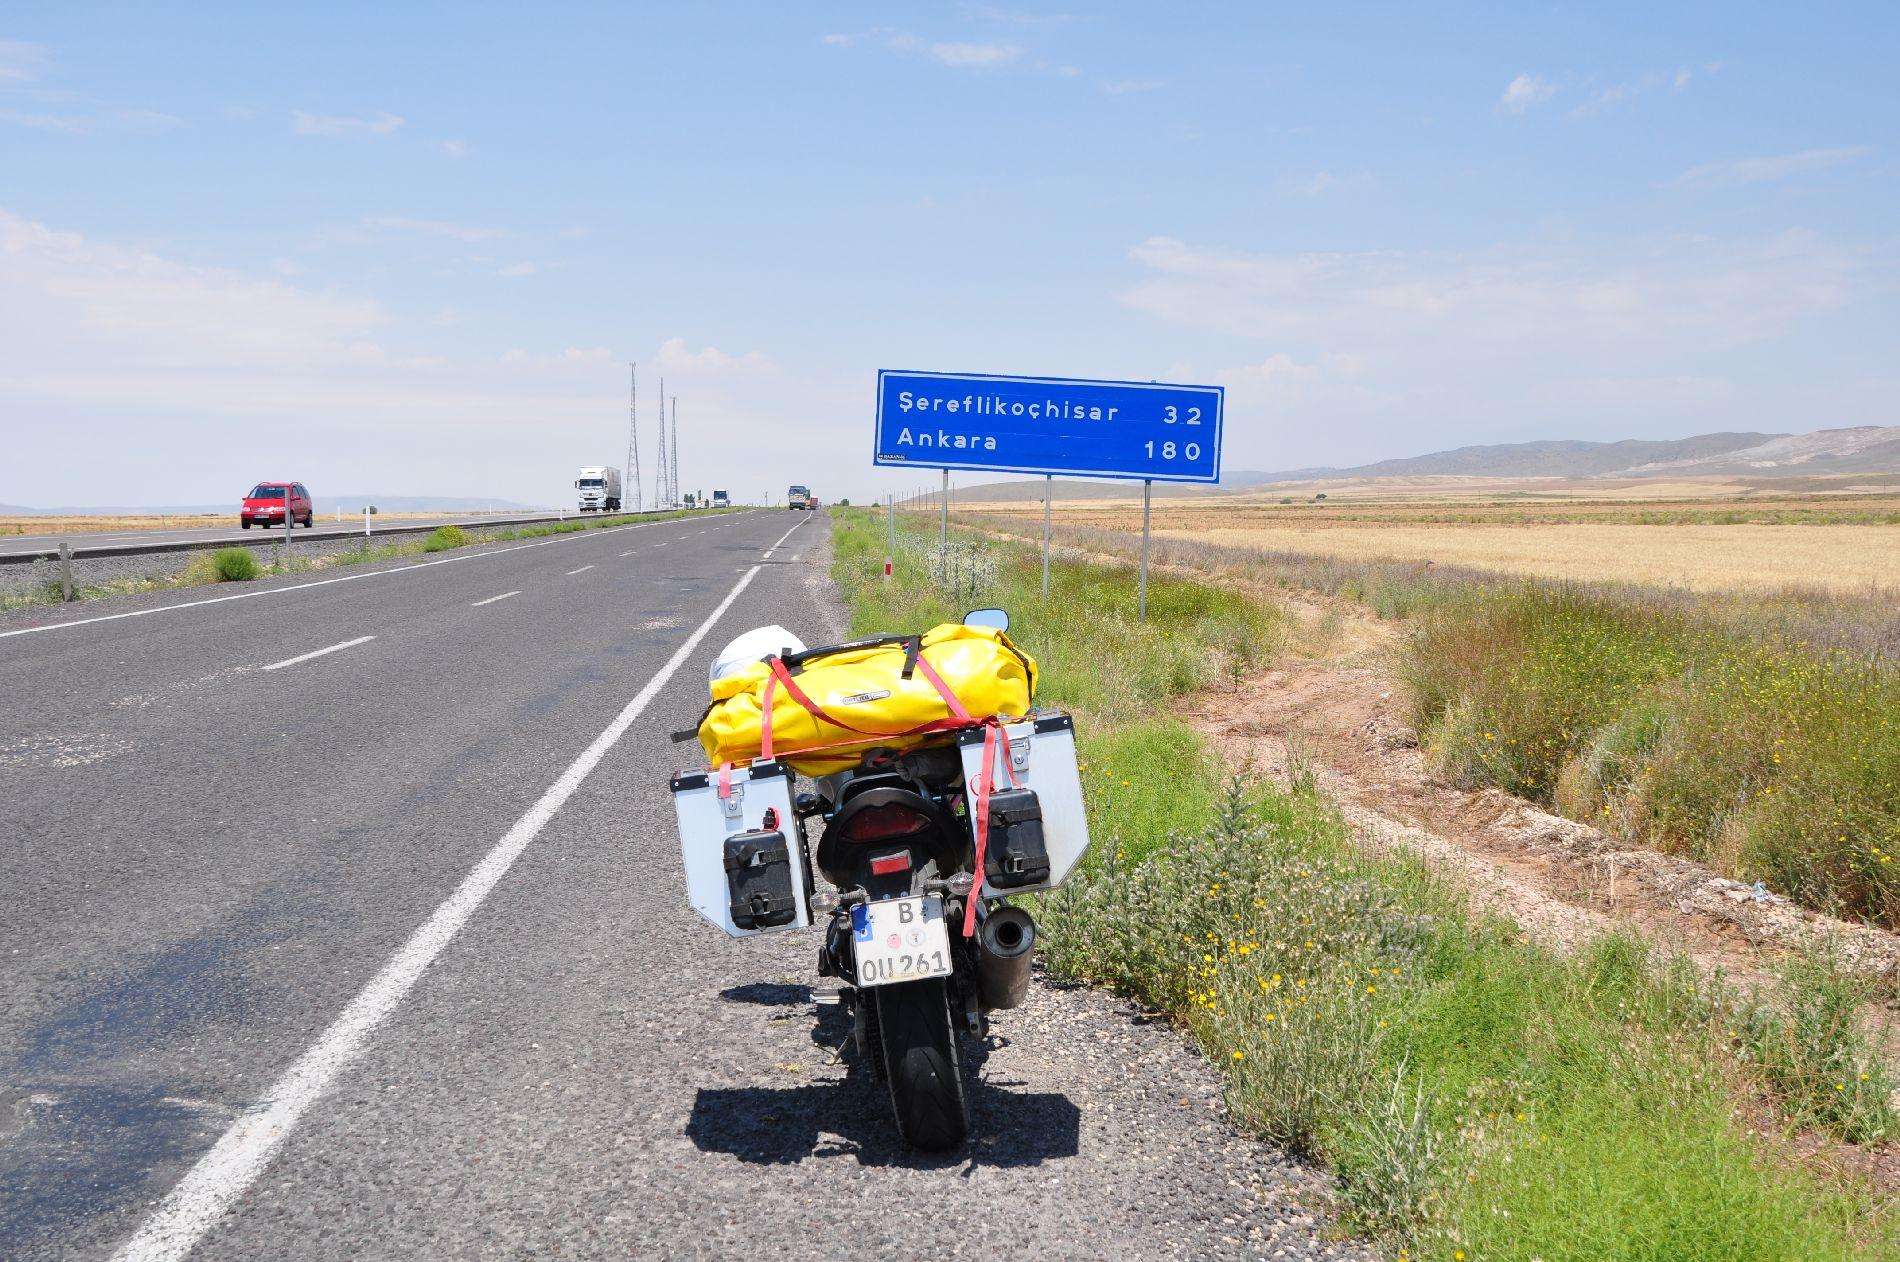 auf dem Weg nach Istanbul ging es durch Ankara